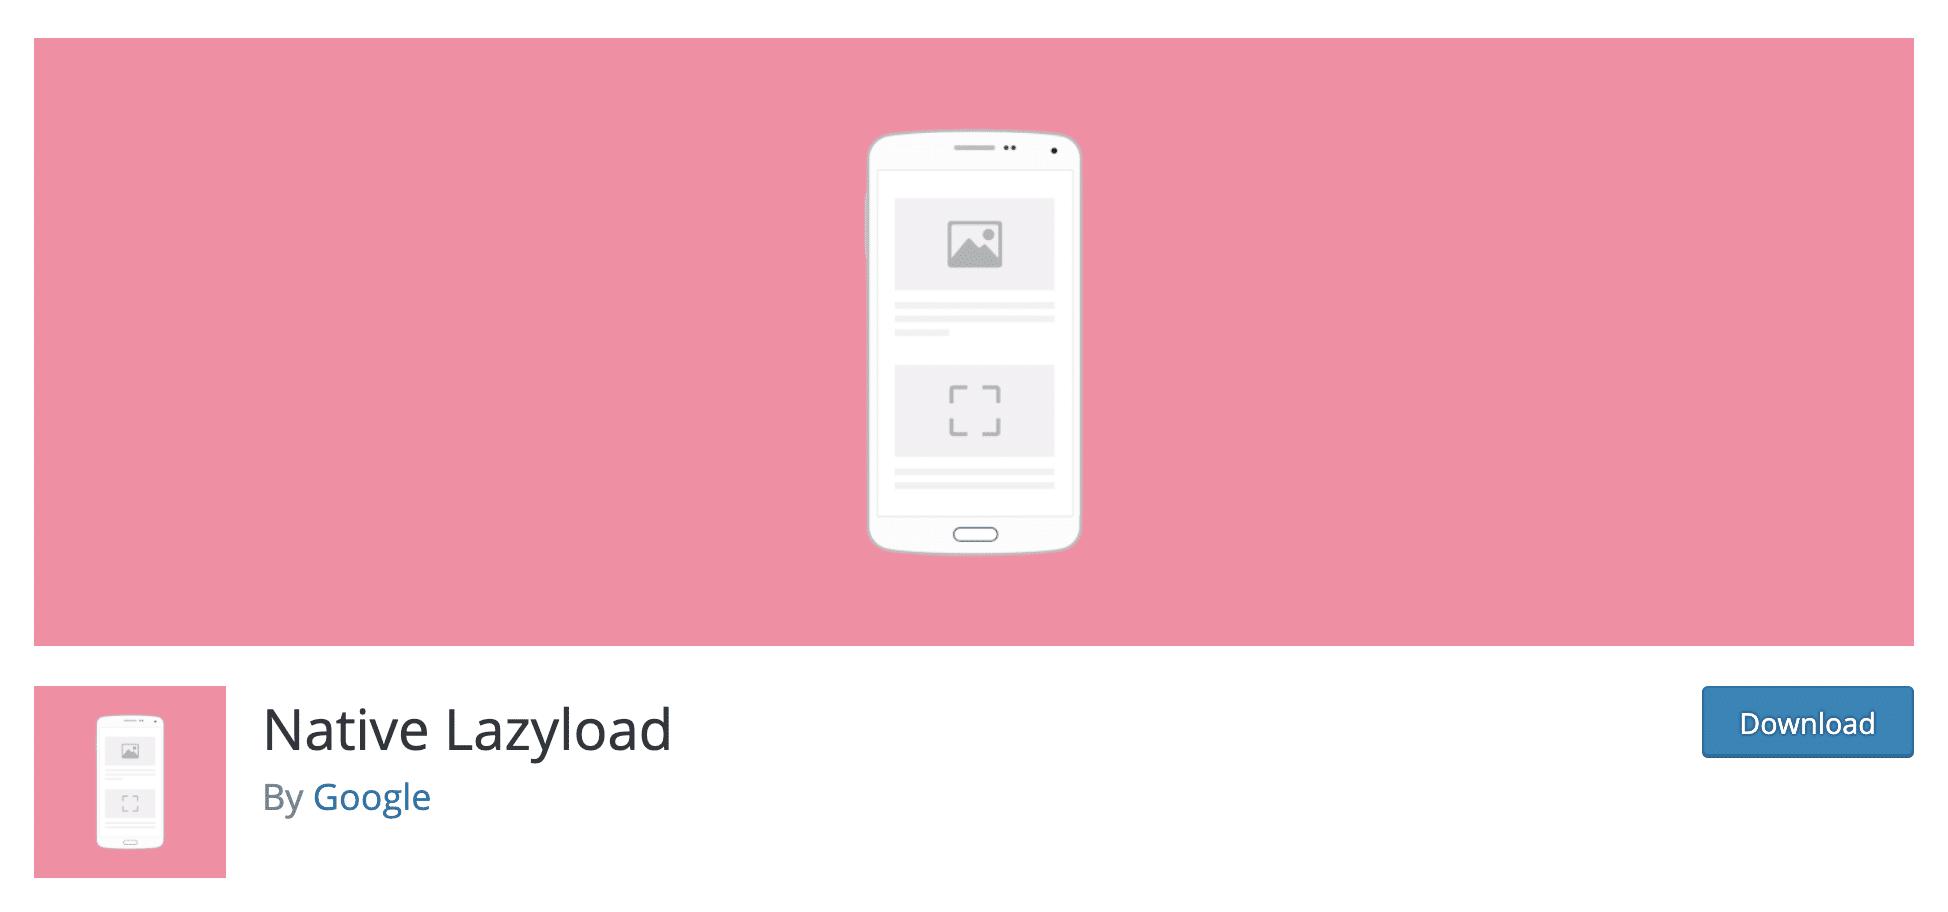 Google Native Lazyload plugin.